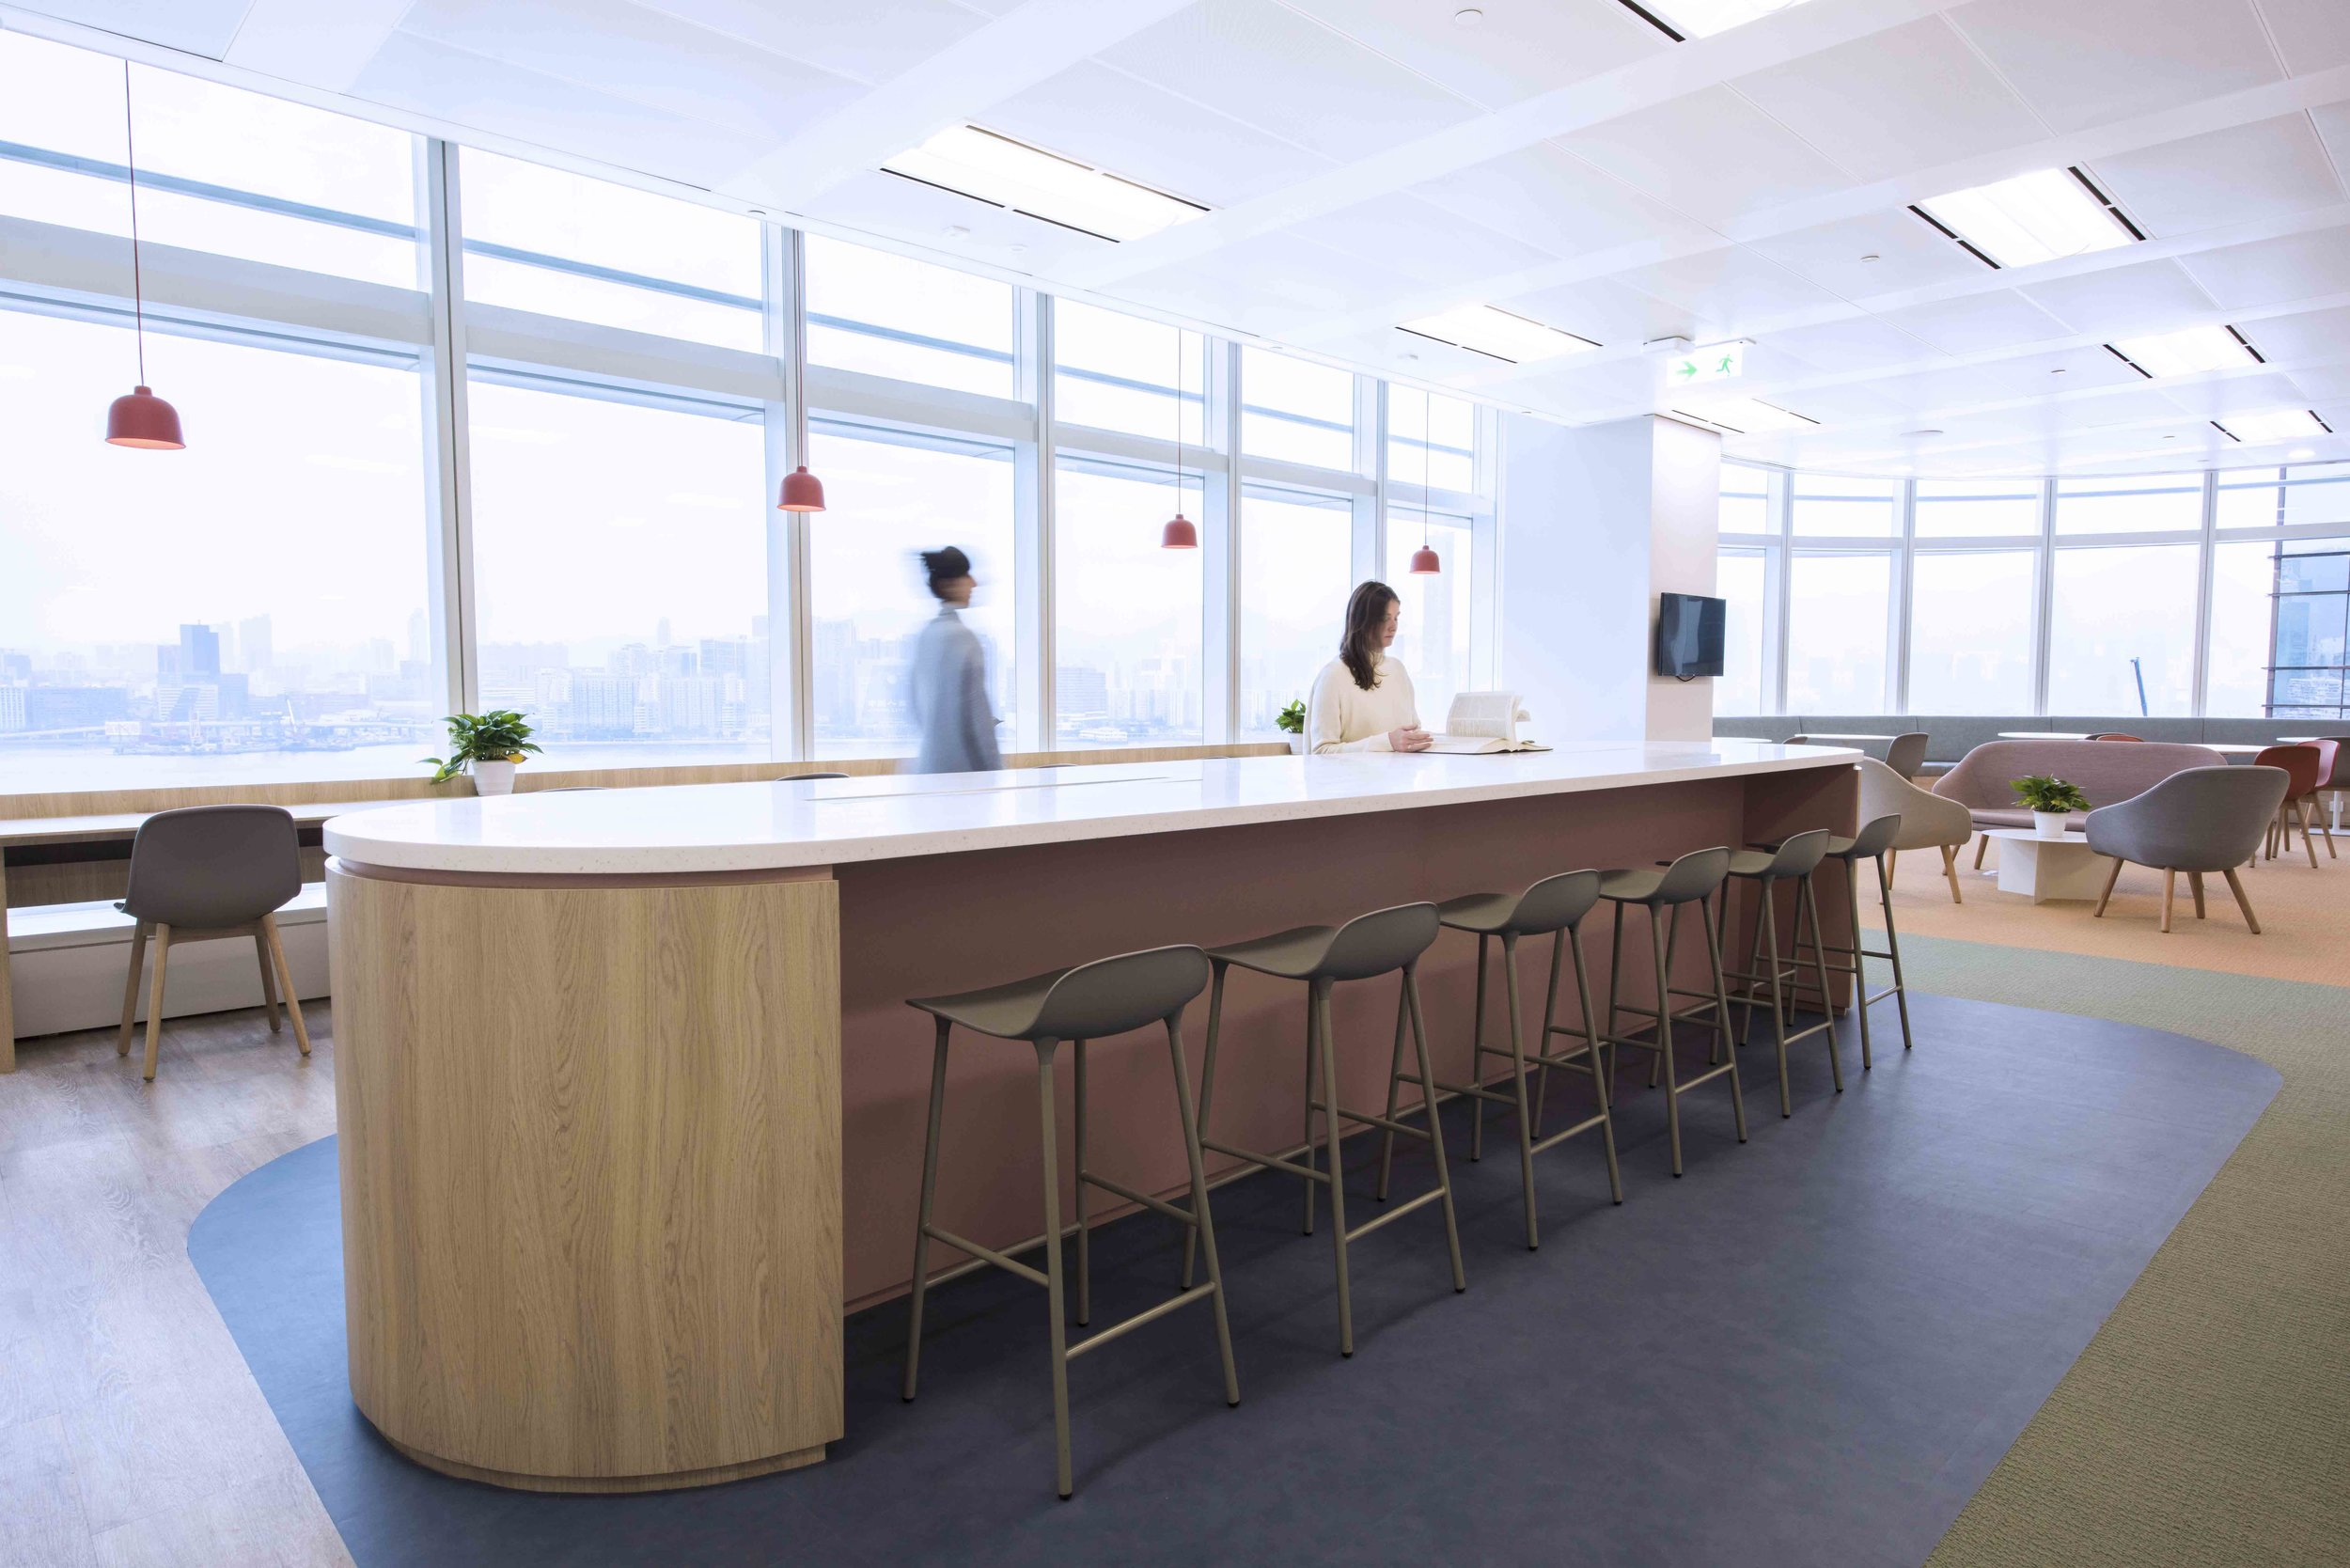 2_BeanBuro_Workplace_AstraZeneca_Photos.jpg